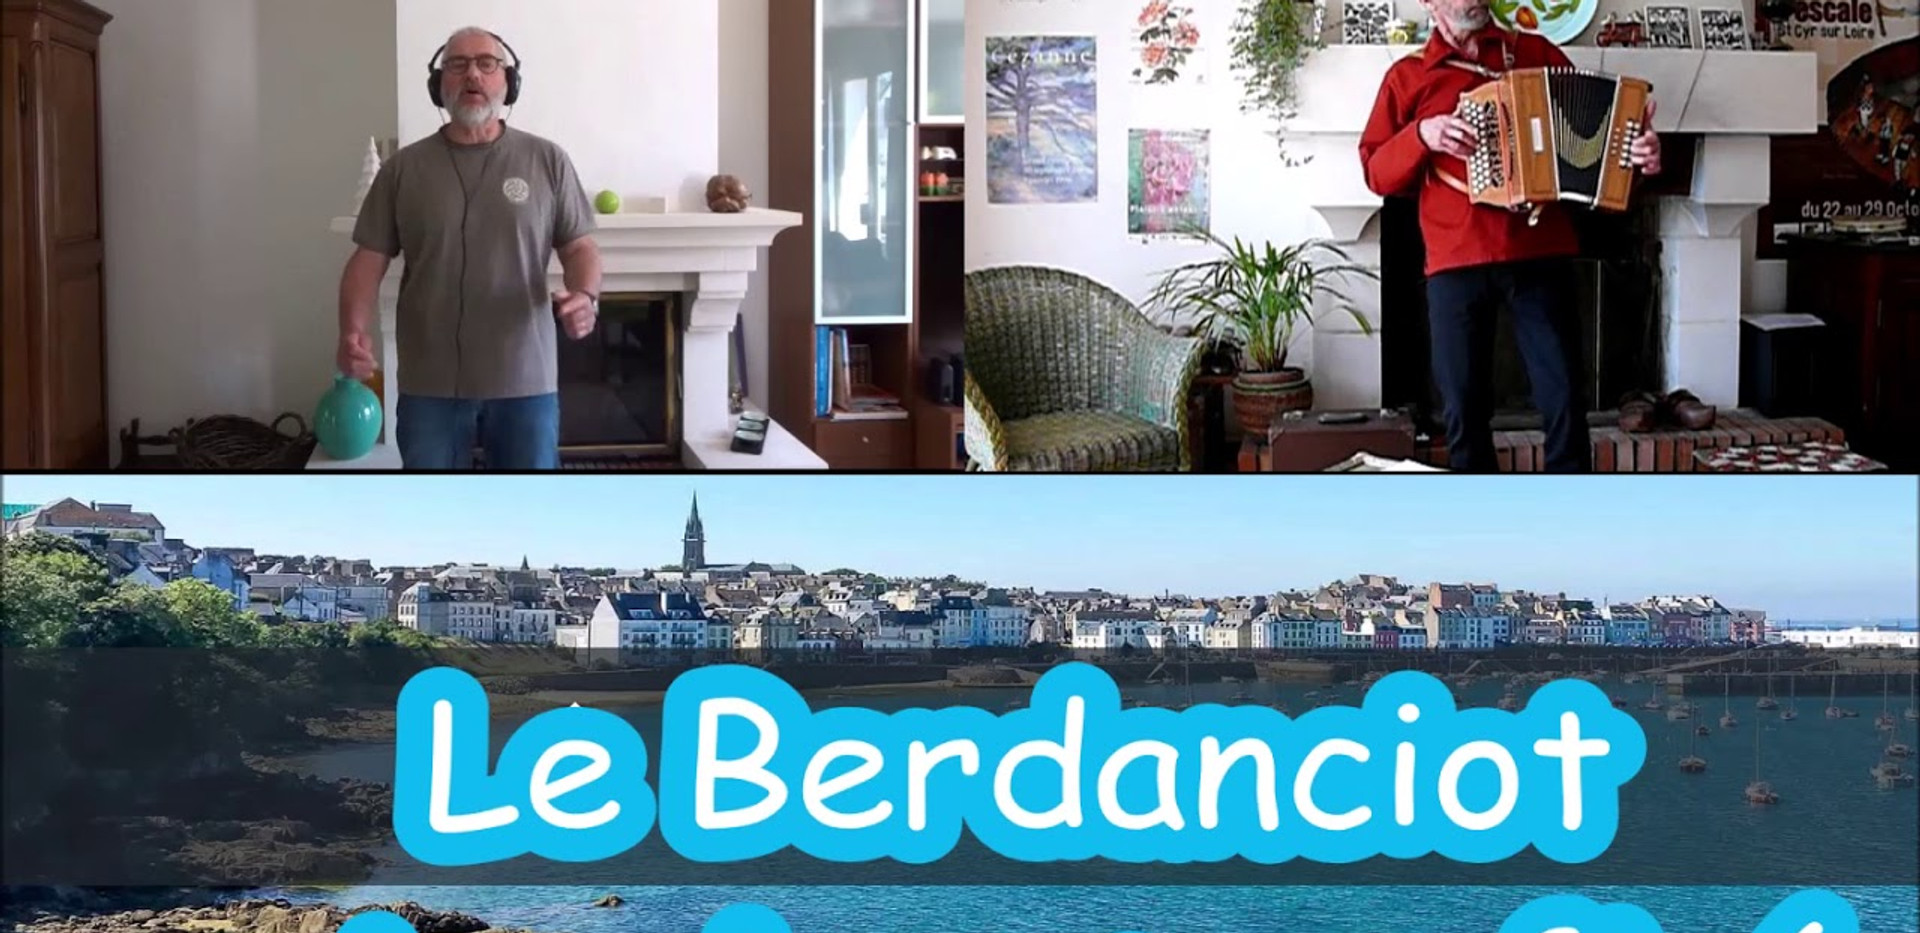 Le Berdanciot - Les penn sardin